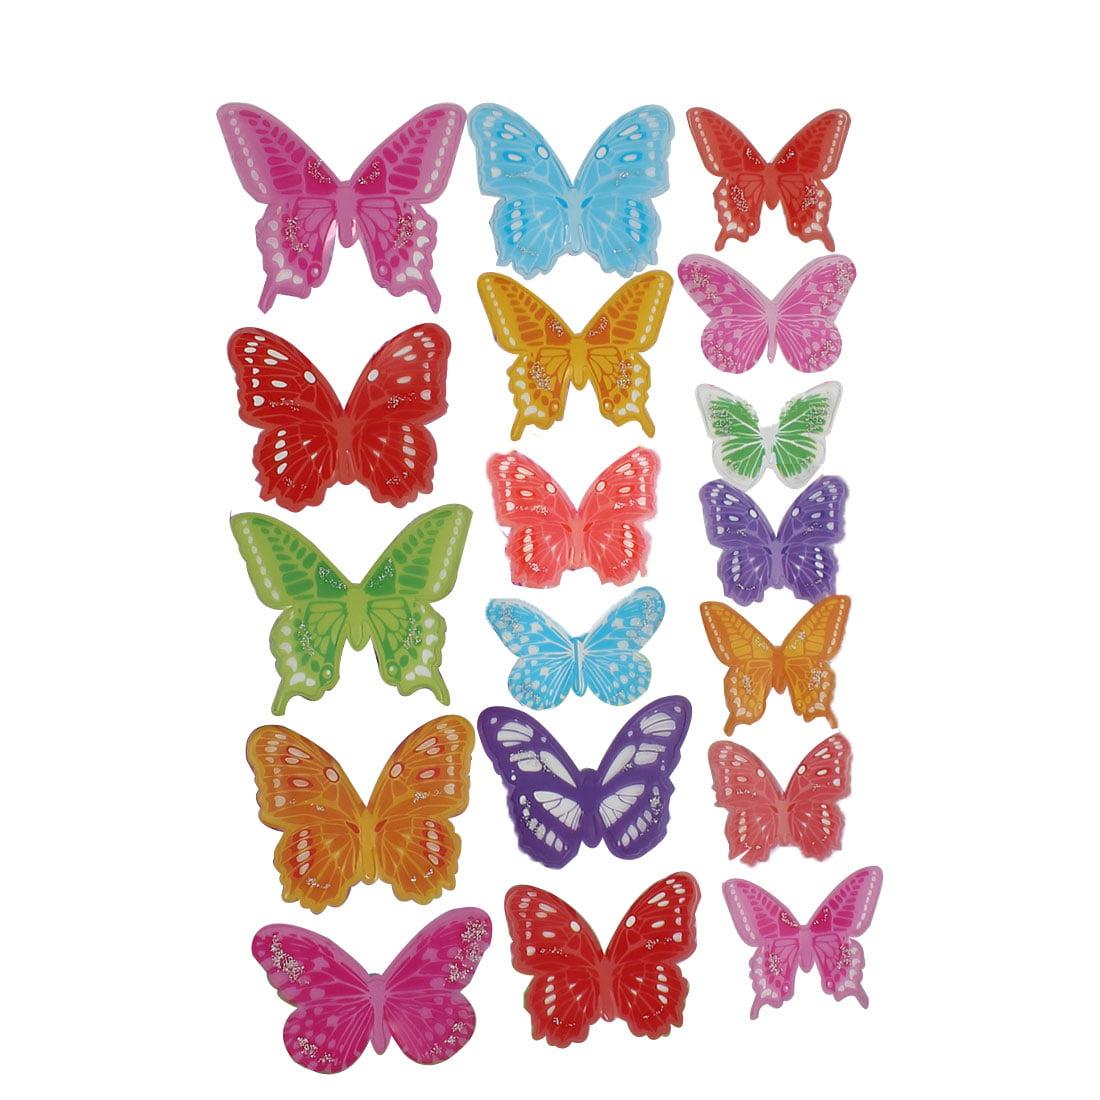 Butterfly Design DIY Bedroom Decal Wall Decor Sticker Multicolor